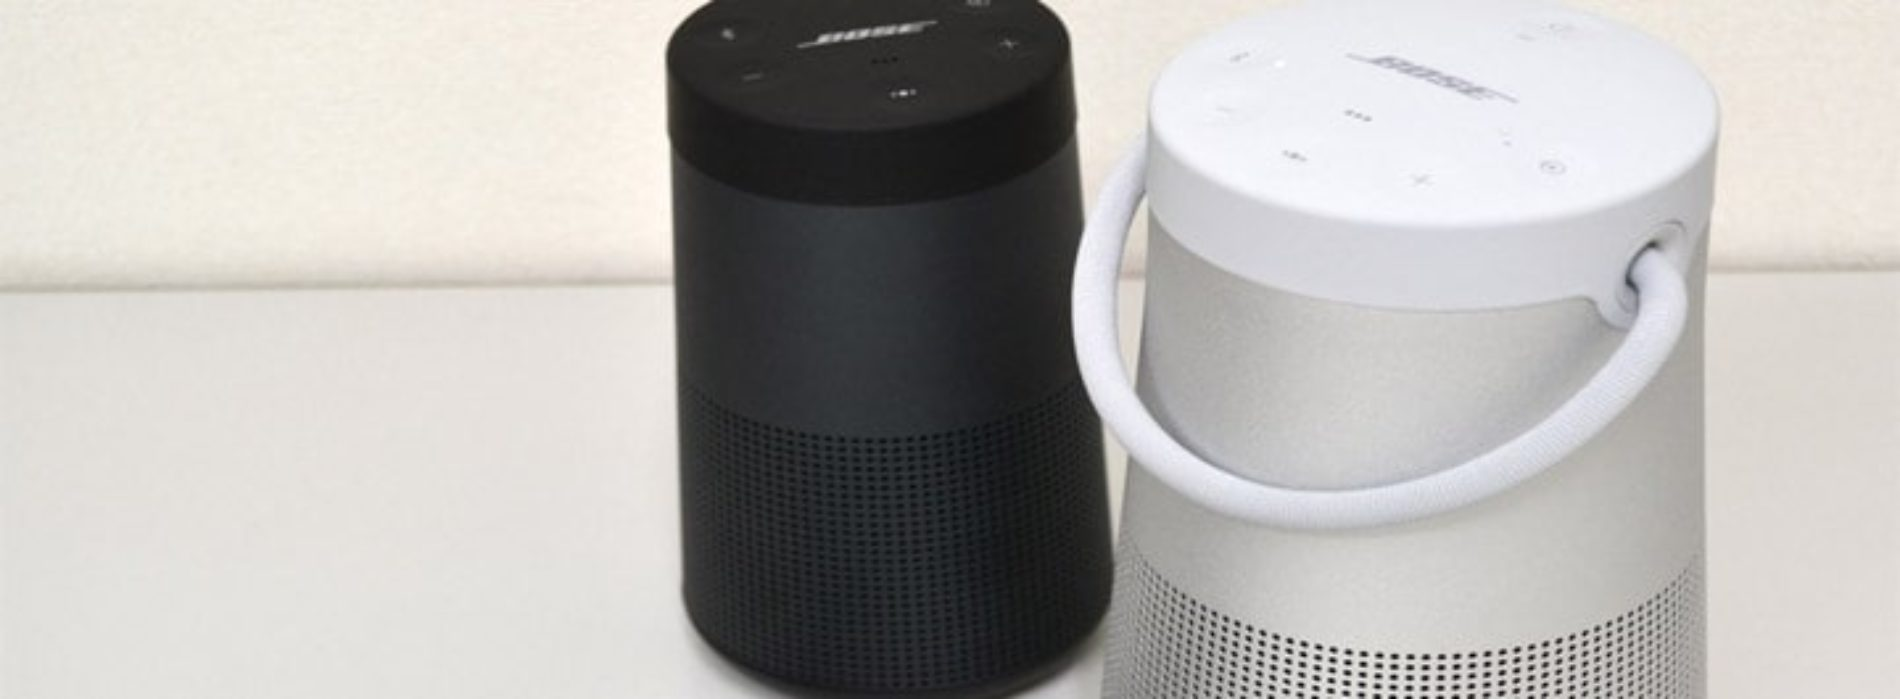 Ремонт Bose SoundLink Revolve